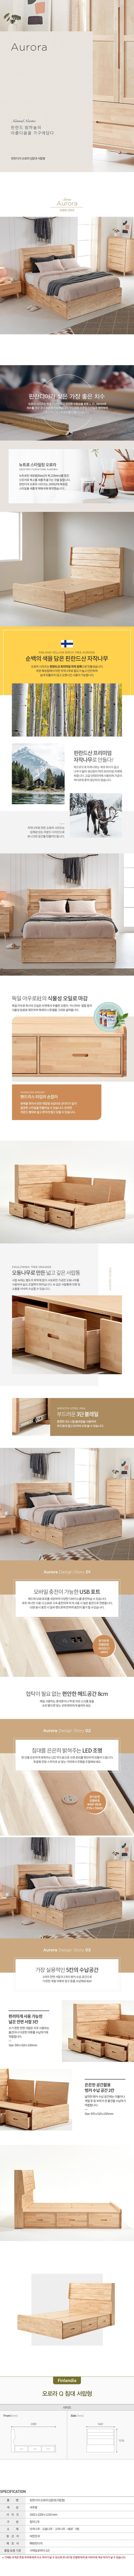 qbed_drawer.jpg